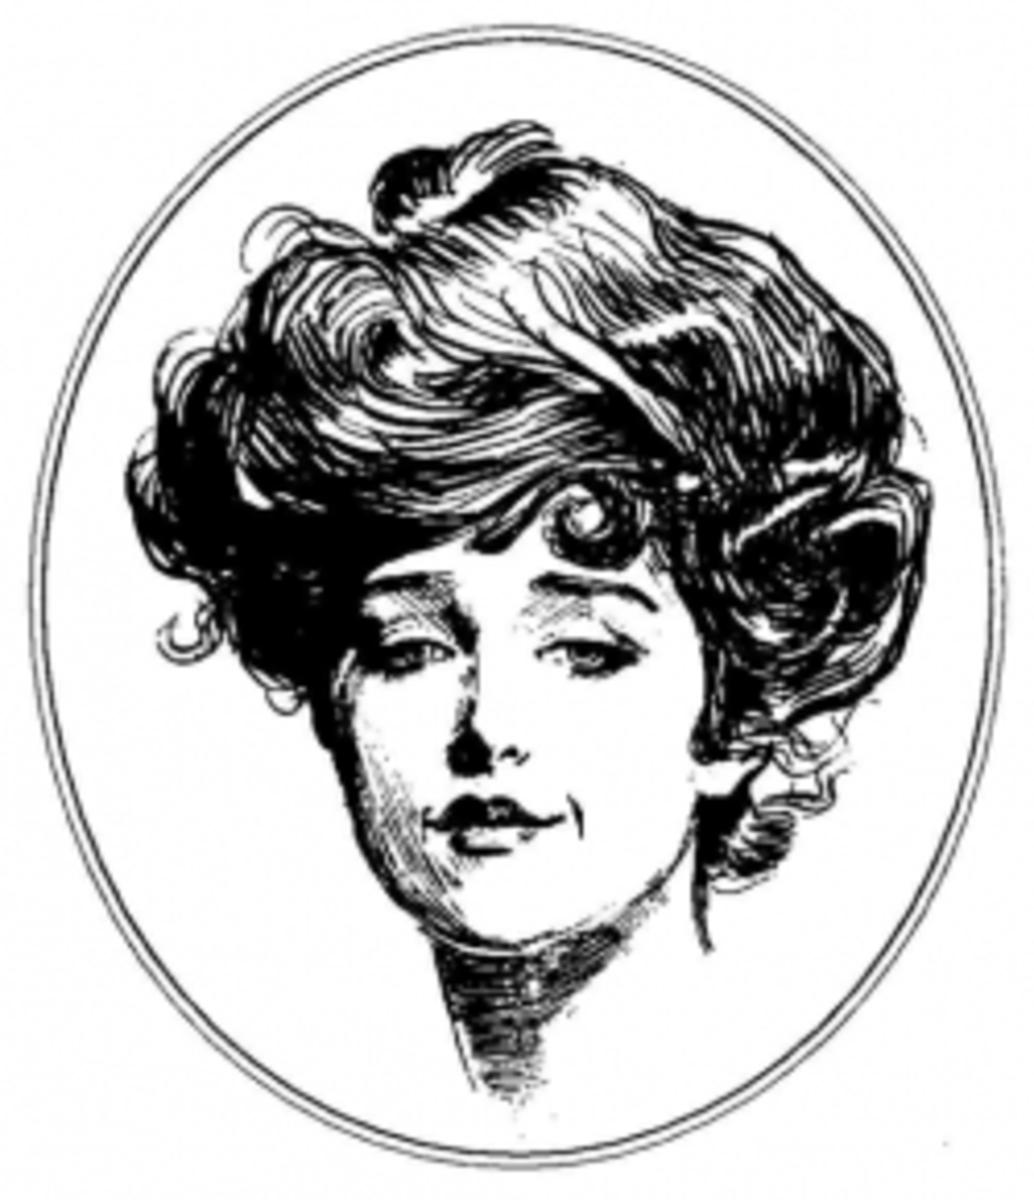 Gibson Girl portrait known as Irene Adler - see note below.